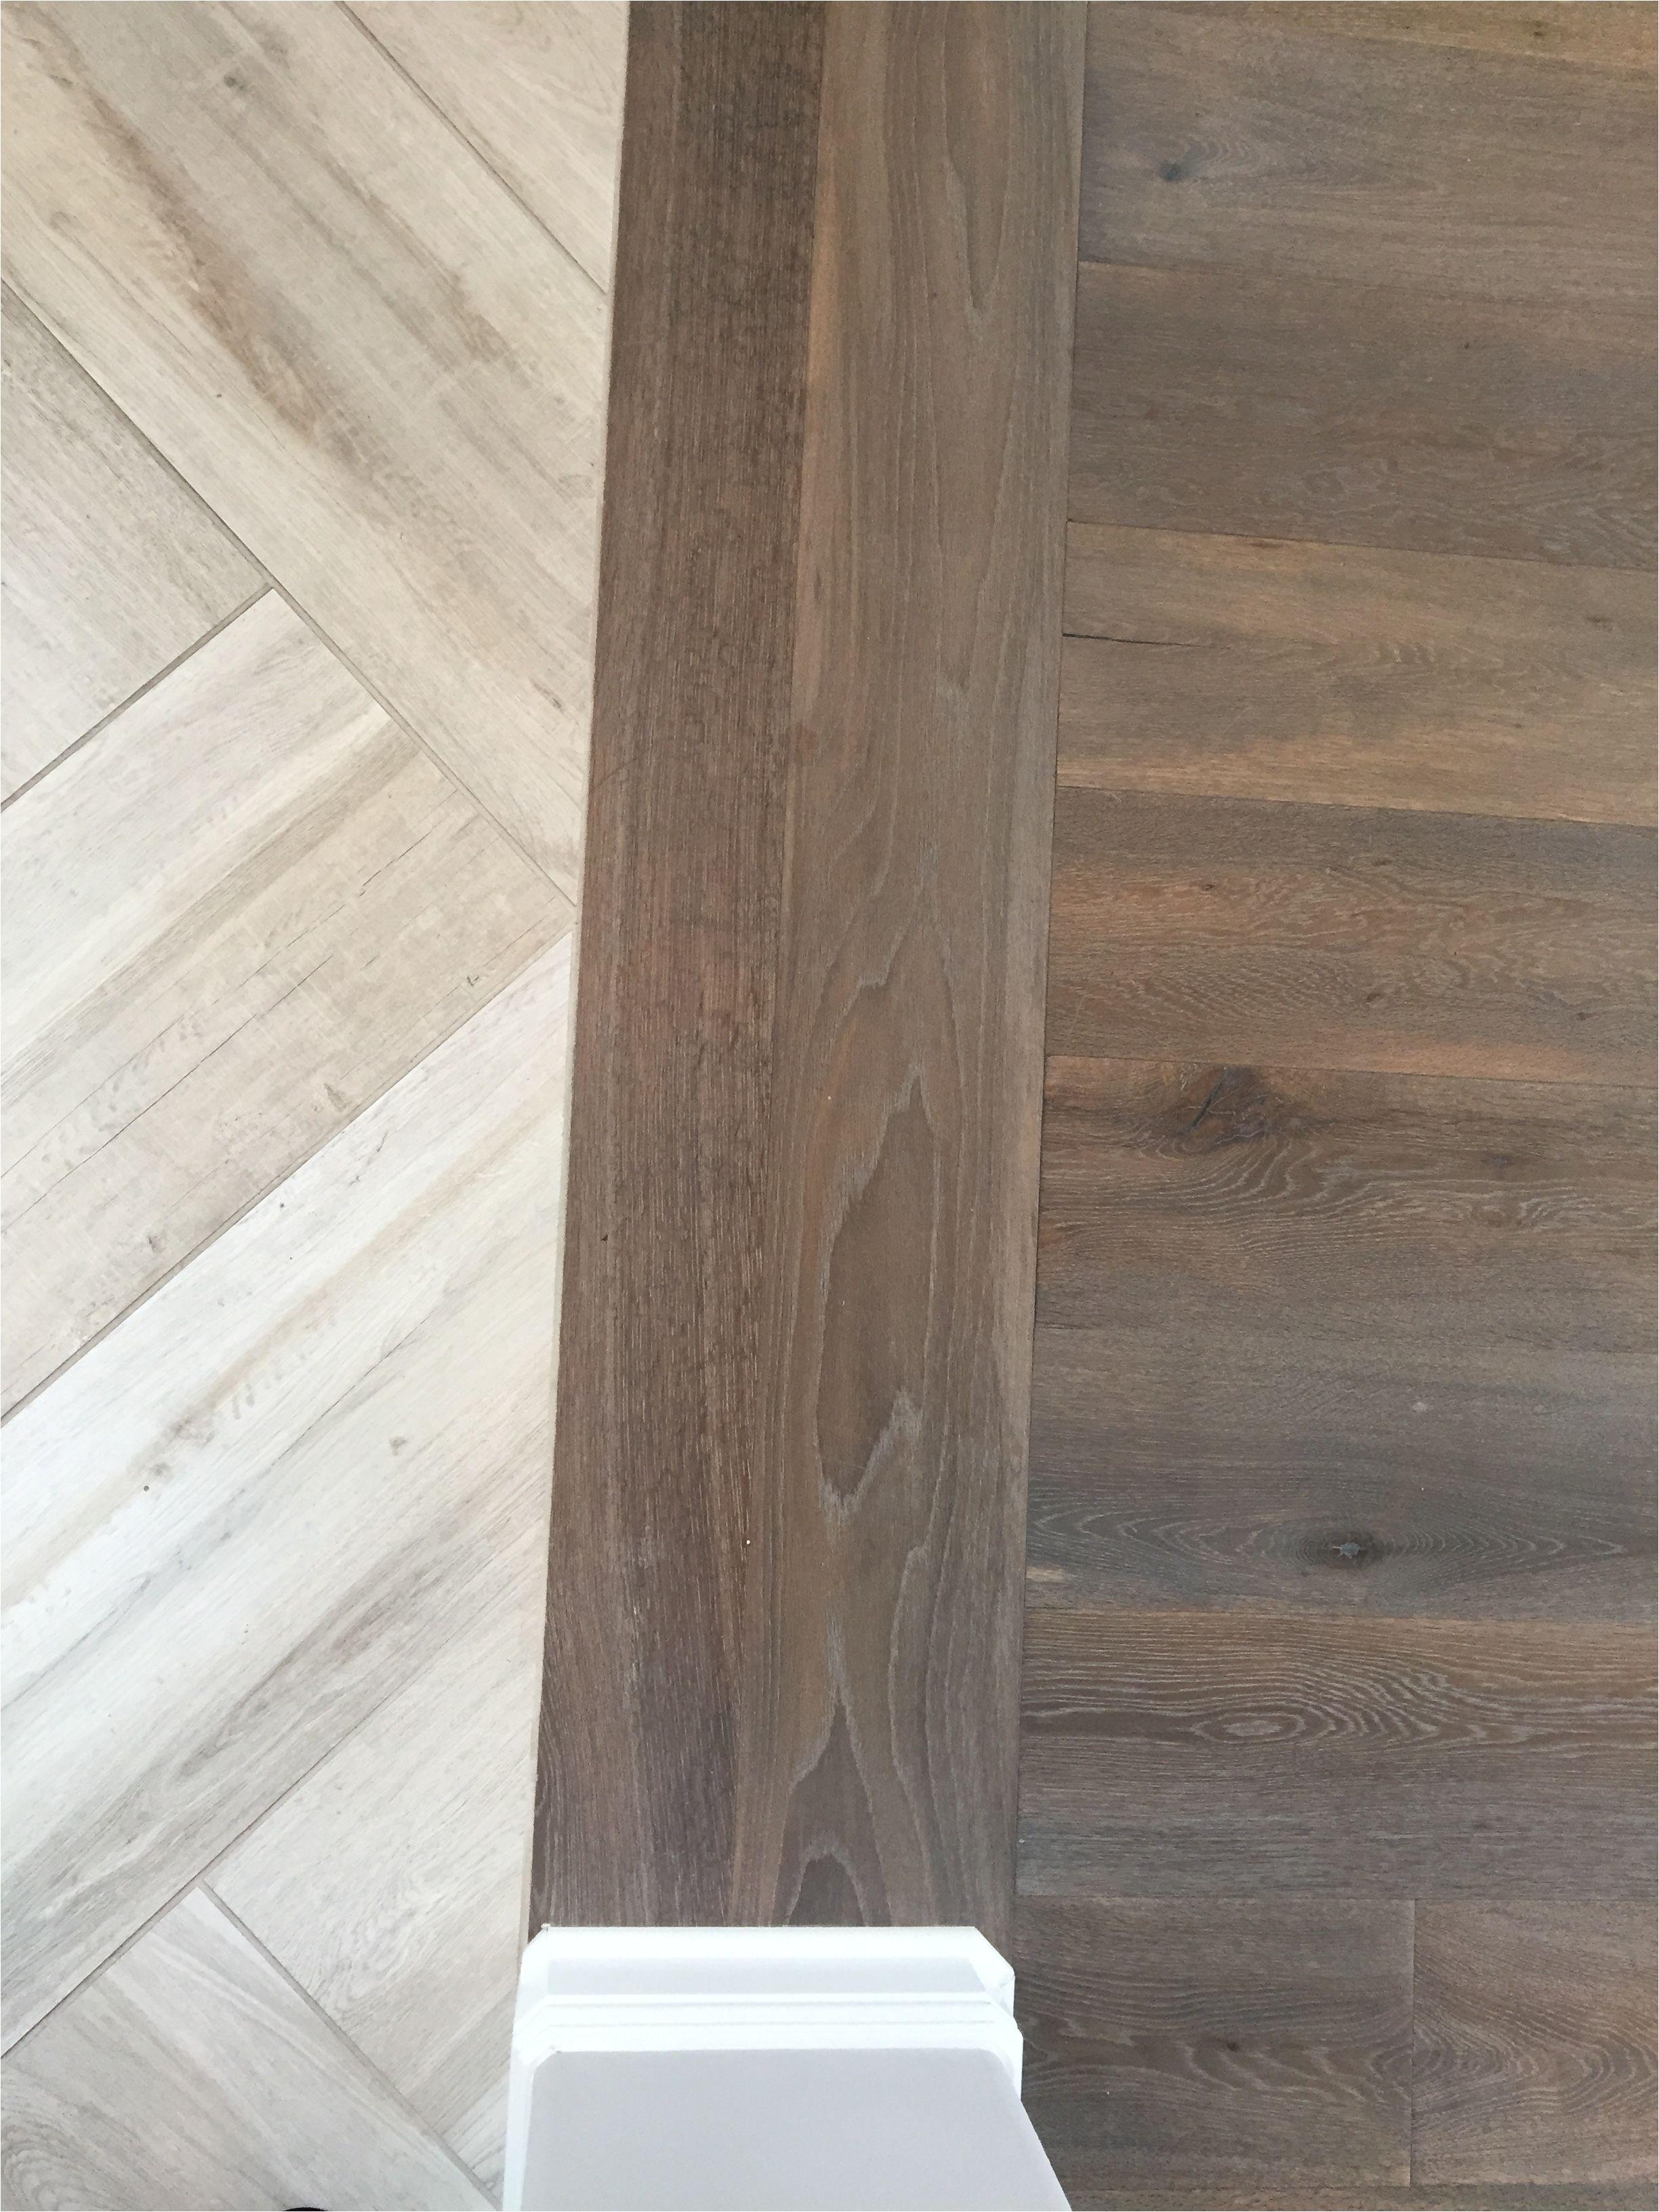 Whitewash Hardwood Floors Floor Transition Laminate to Herringbone Tile Pattern Model